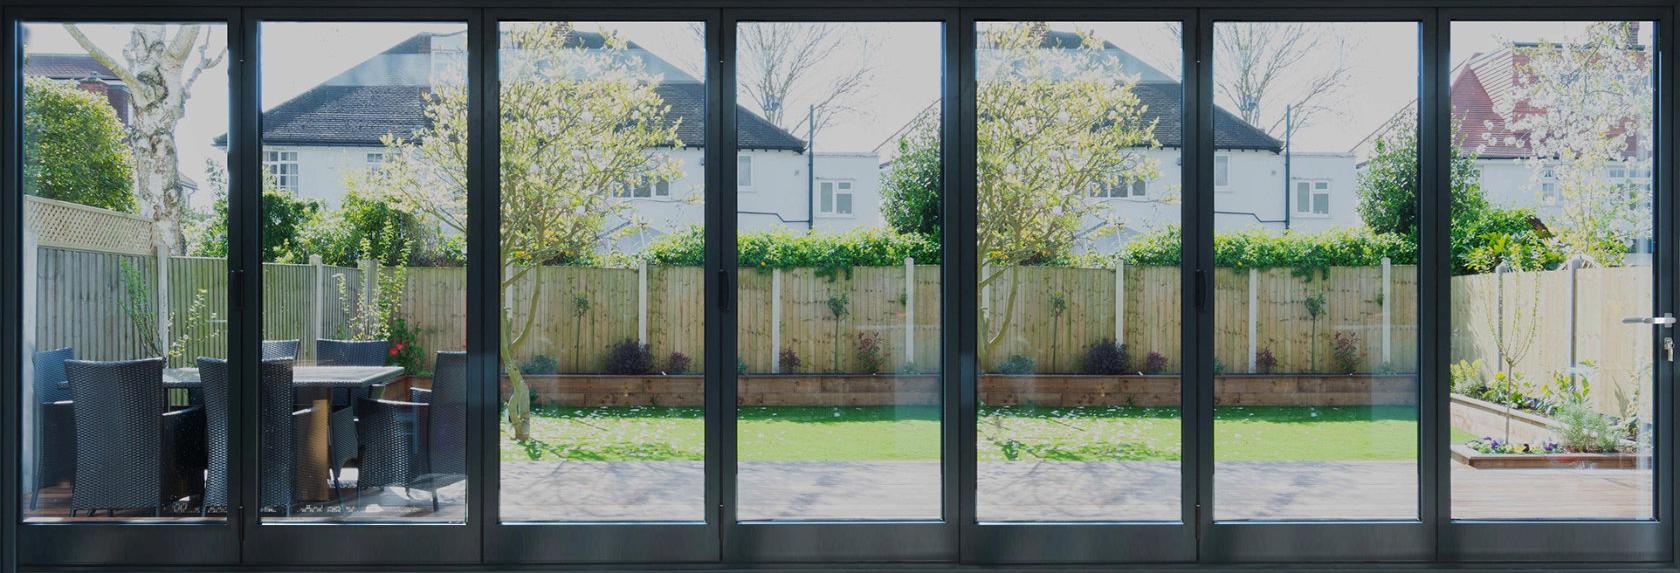 Rail n Stile Bi-Fold Doors 7 panels